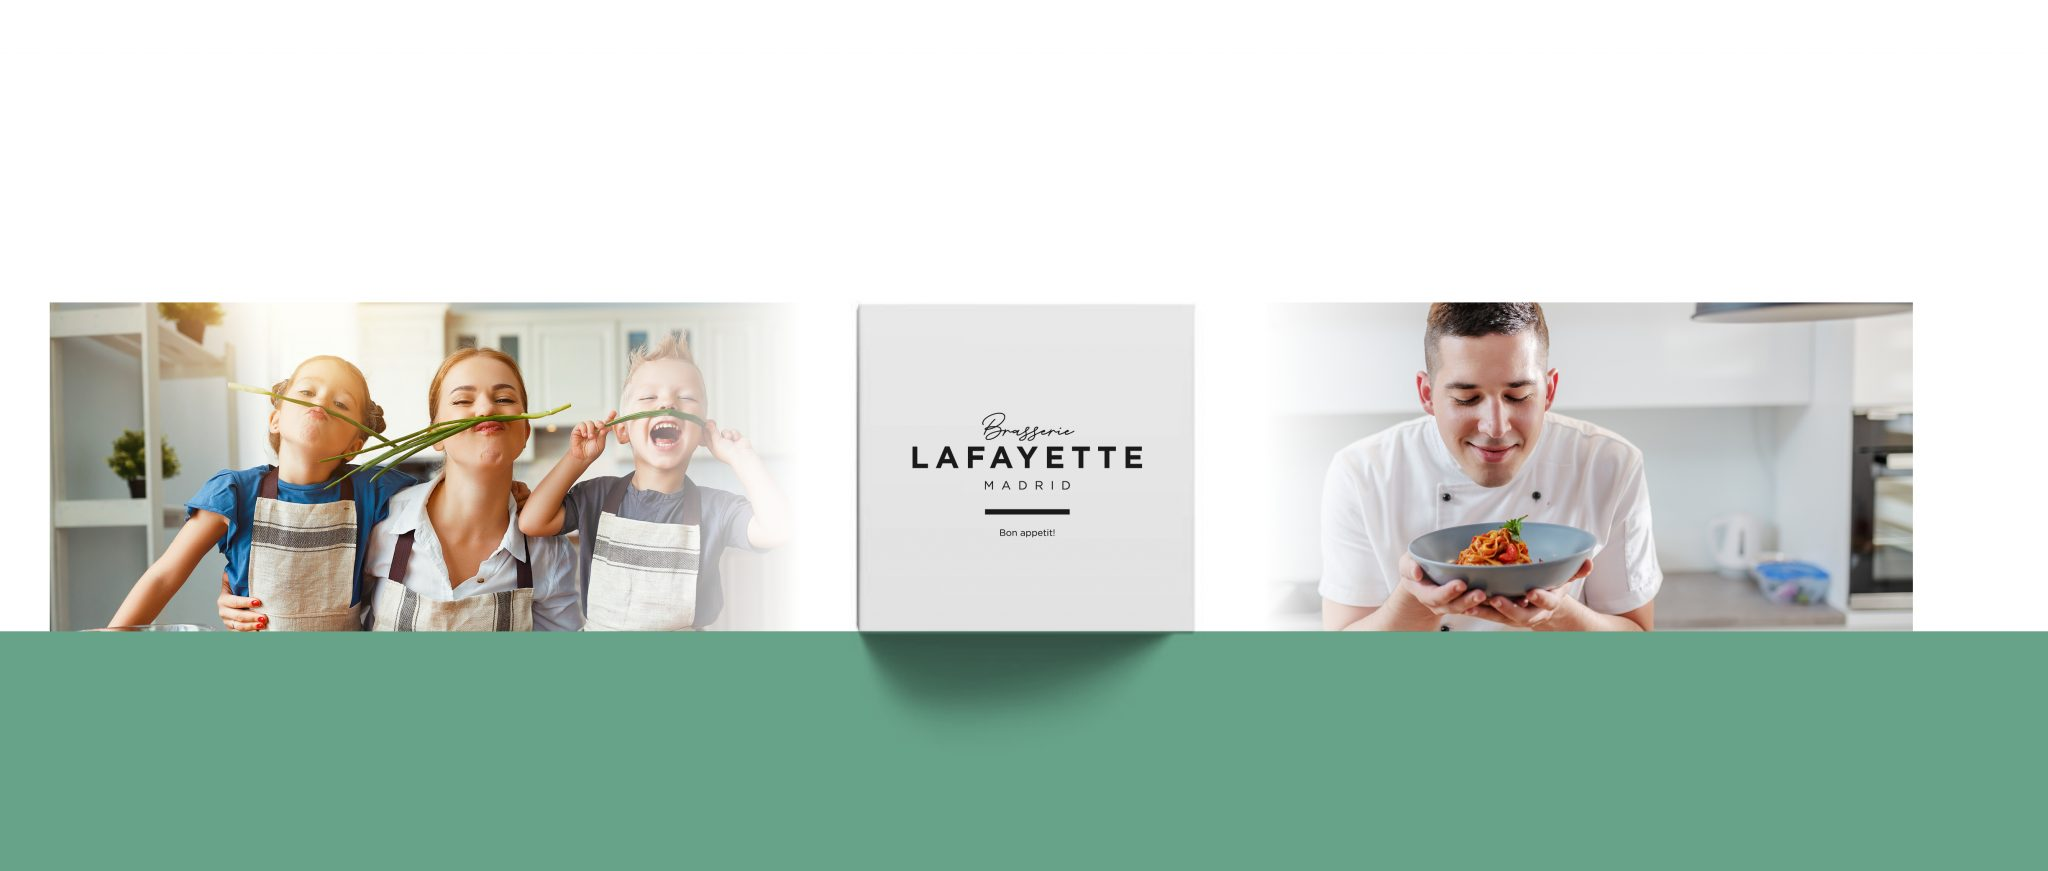 Caja Lafayette